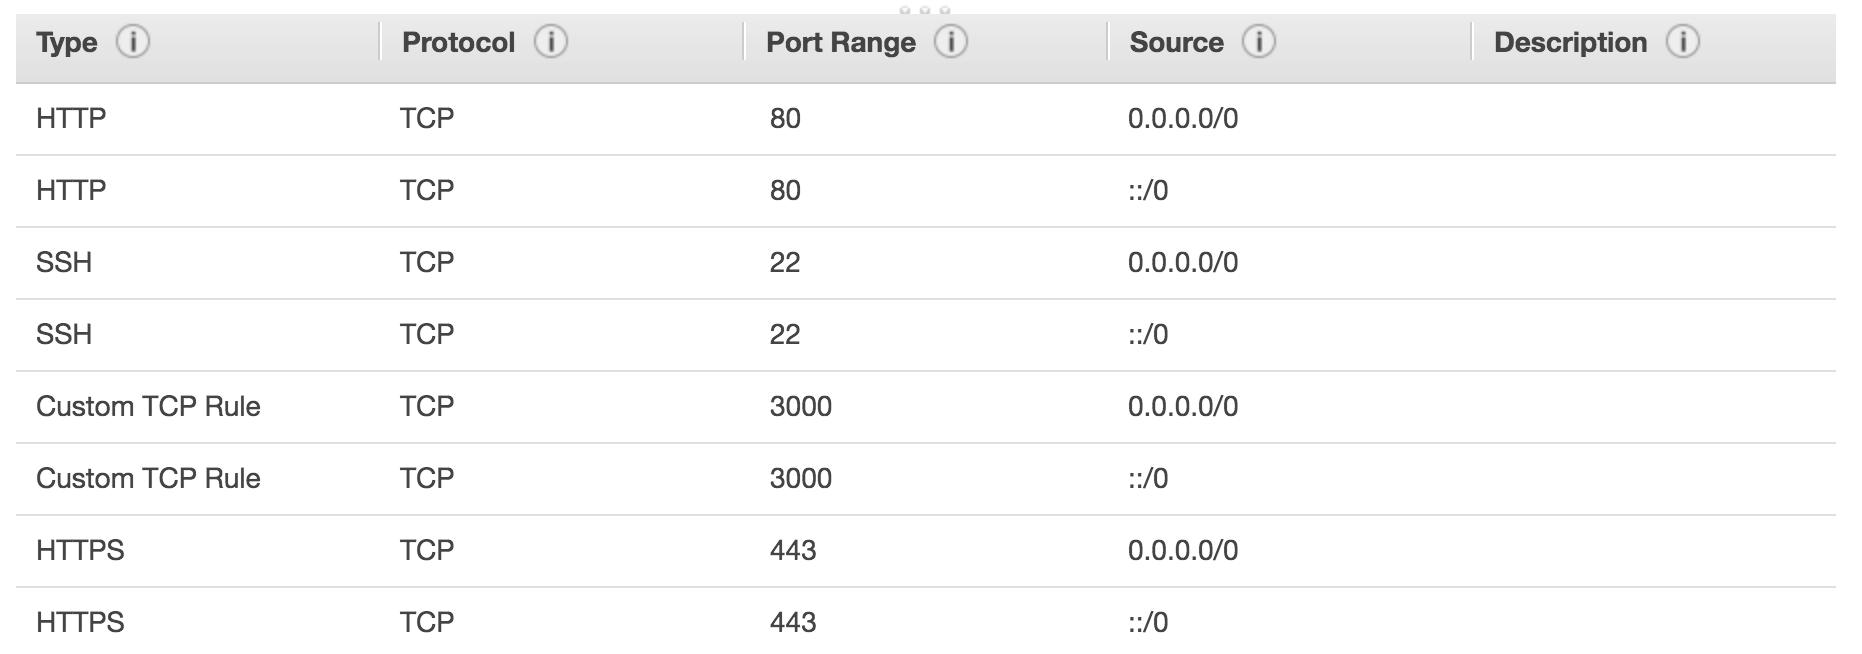 umair-akbar-security - Deploy NodeJS App to AWS EC2 Instance